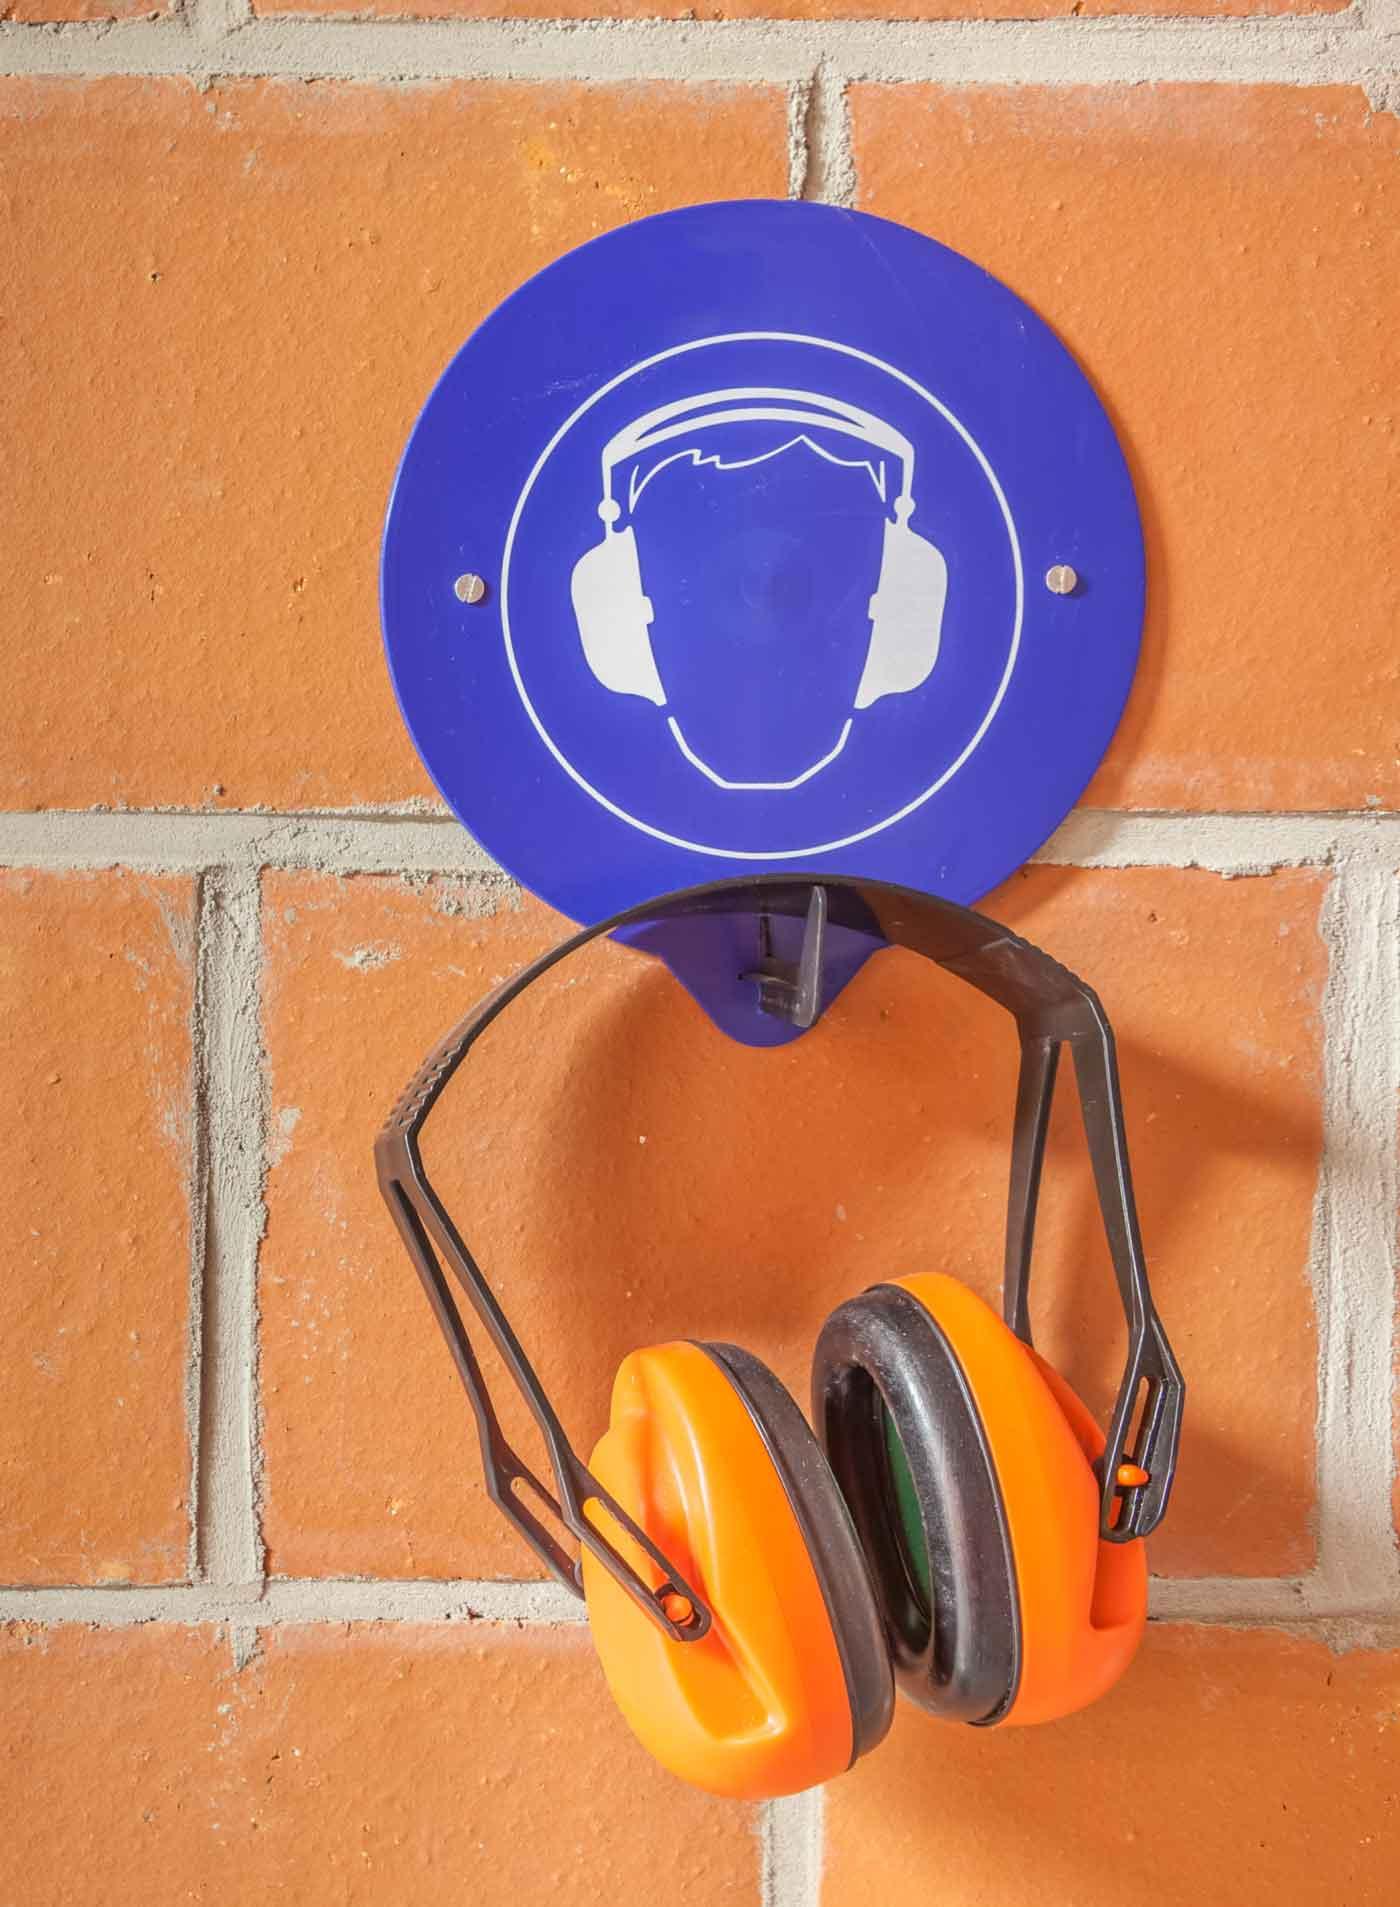 Warnschild Lärmschutz, Micky Mäuse - Kopfhörer